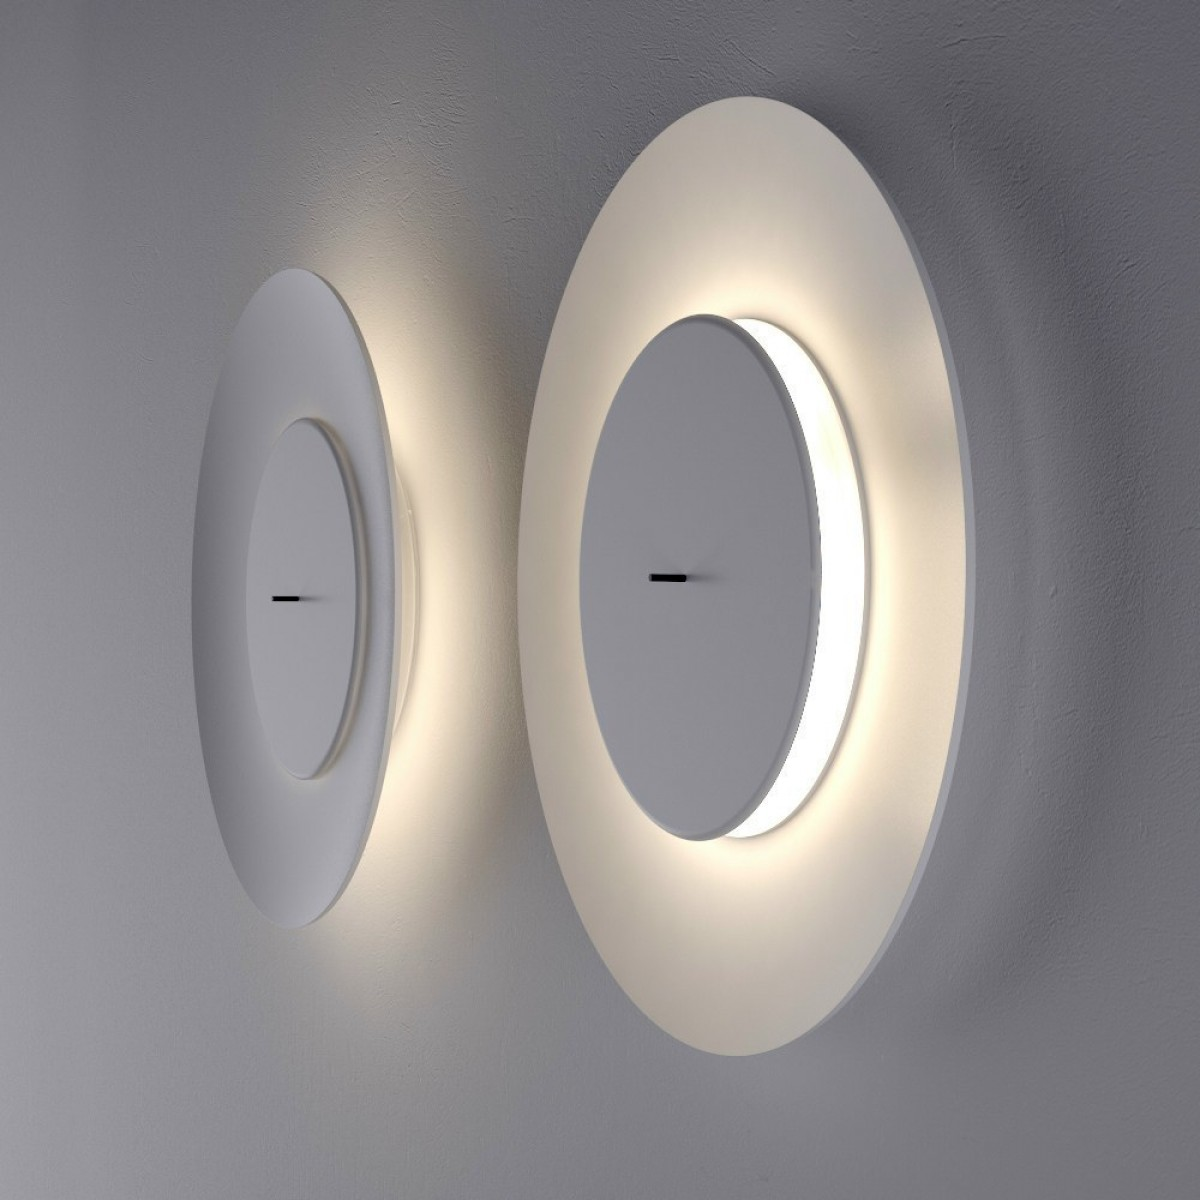 Fontanaarte lunaire bianca wall lamp outlet for Lunaire fontana arte